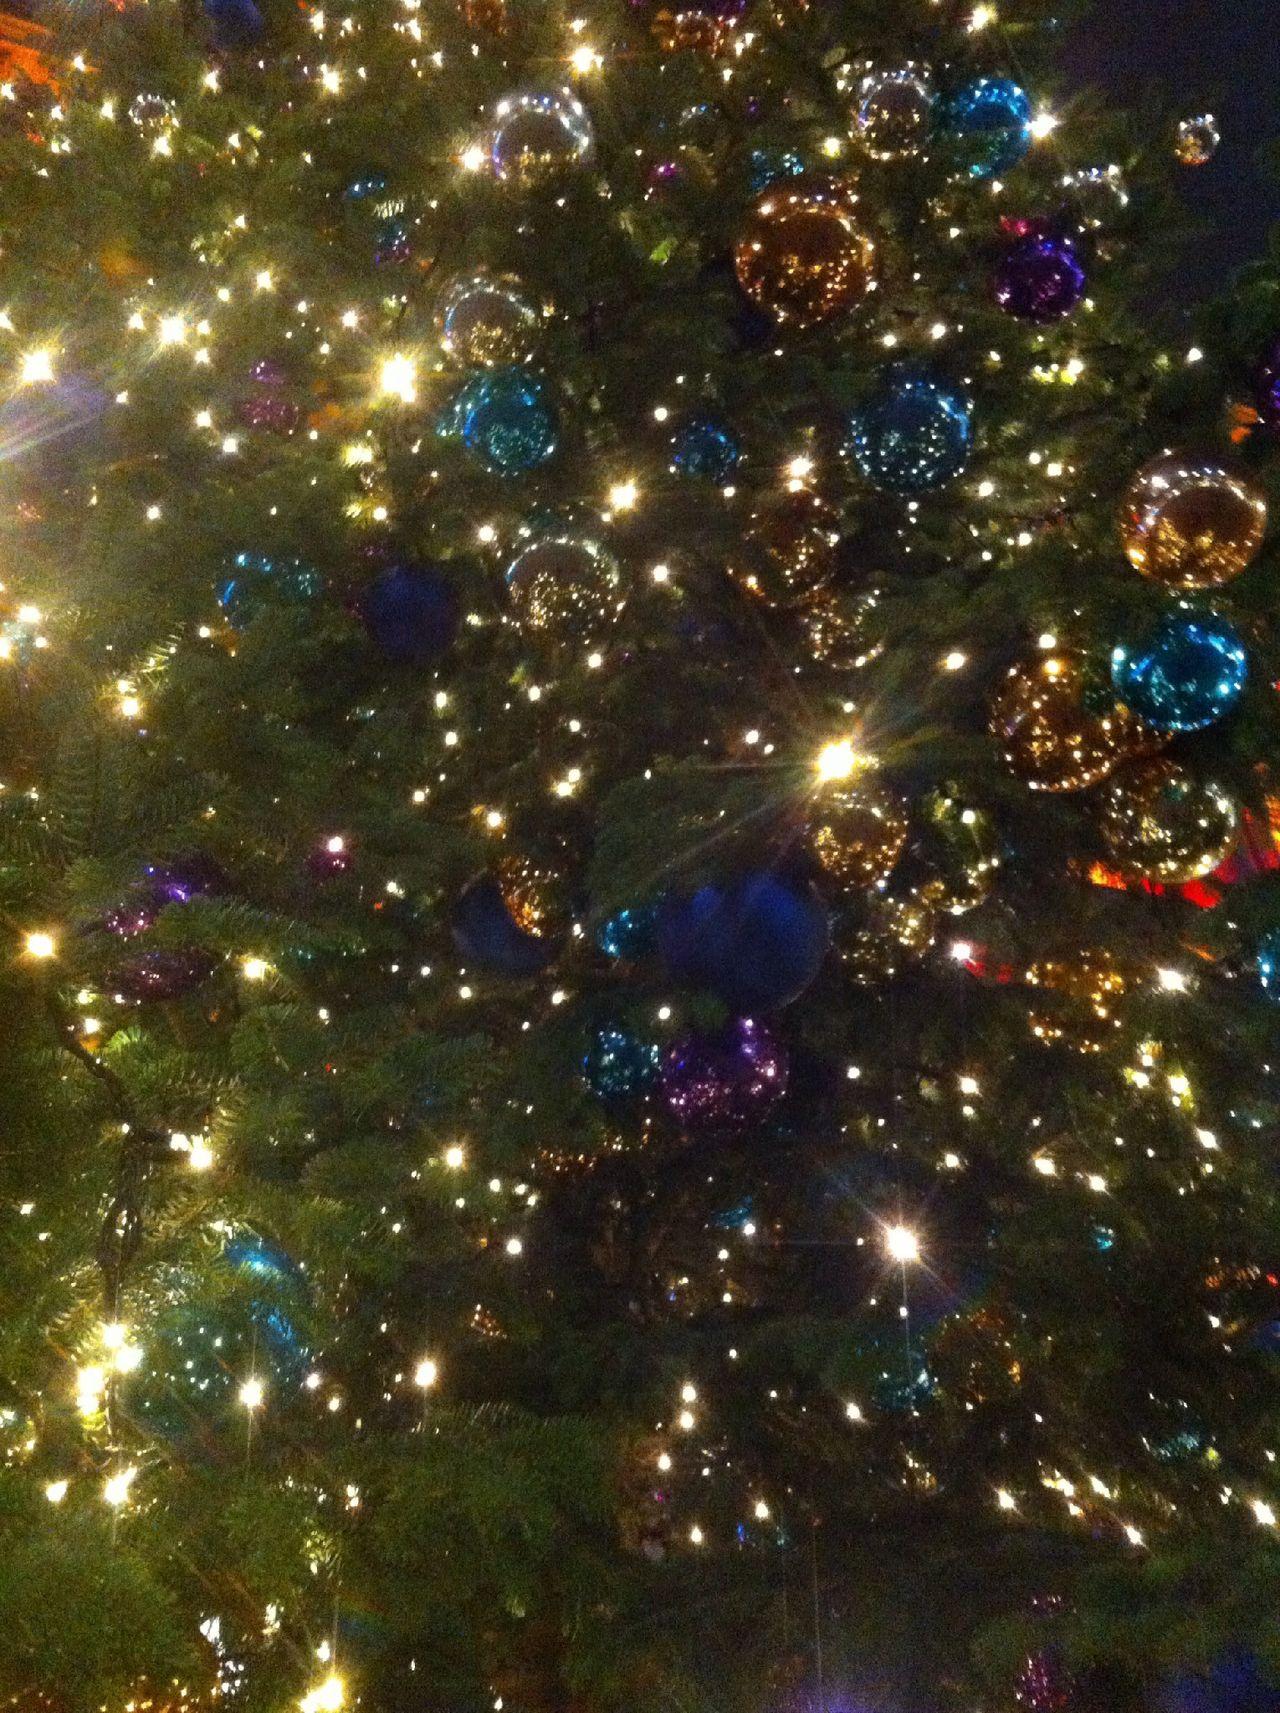 Weihnachtsbaum ?? Tadaa Community Christmas Christmas Tree Weihnachten